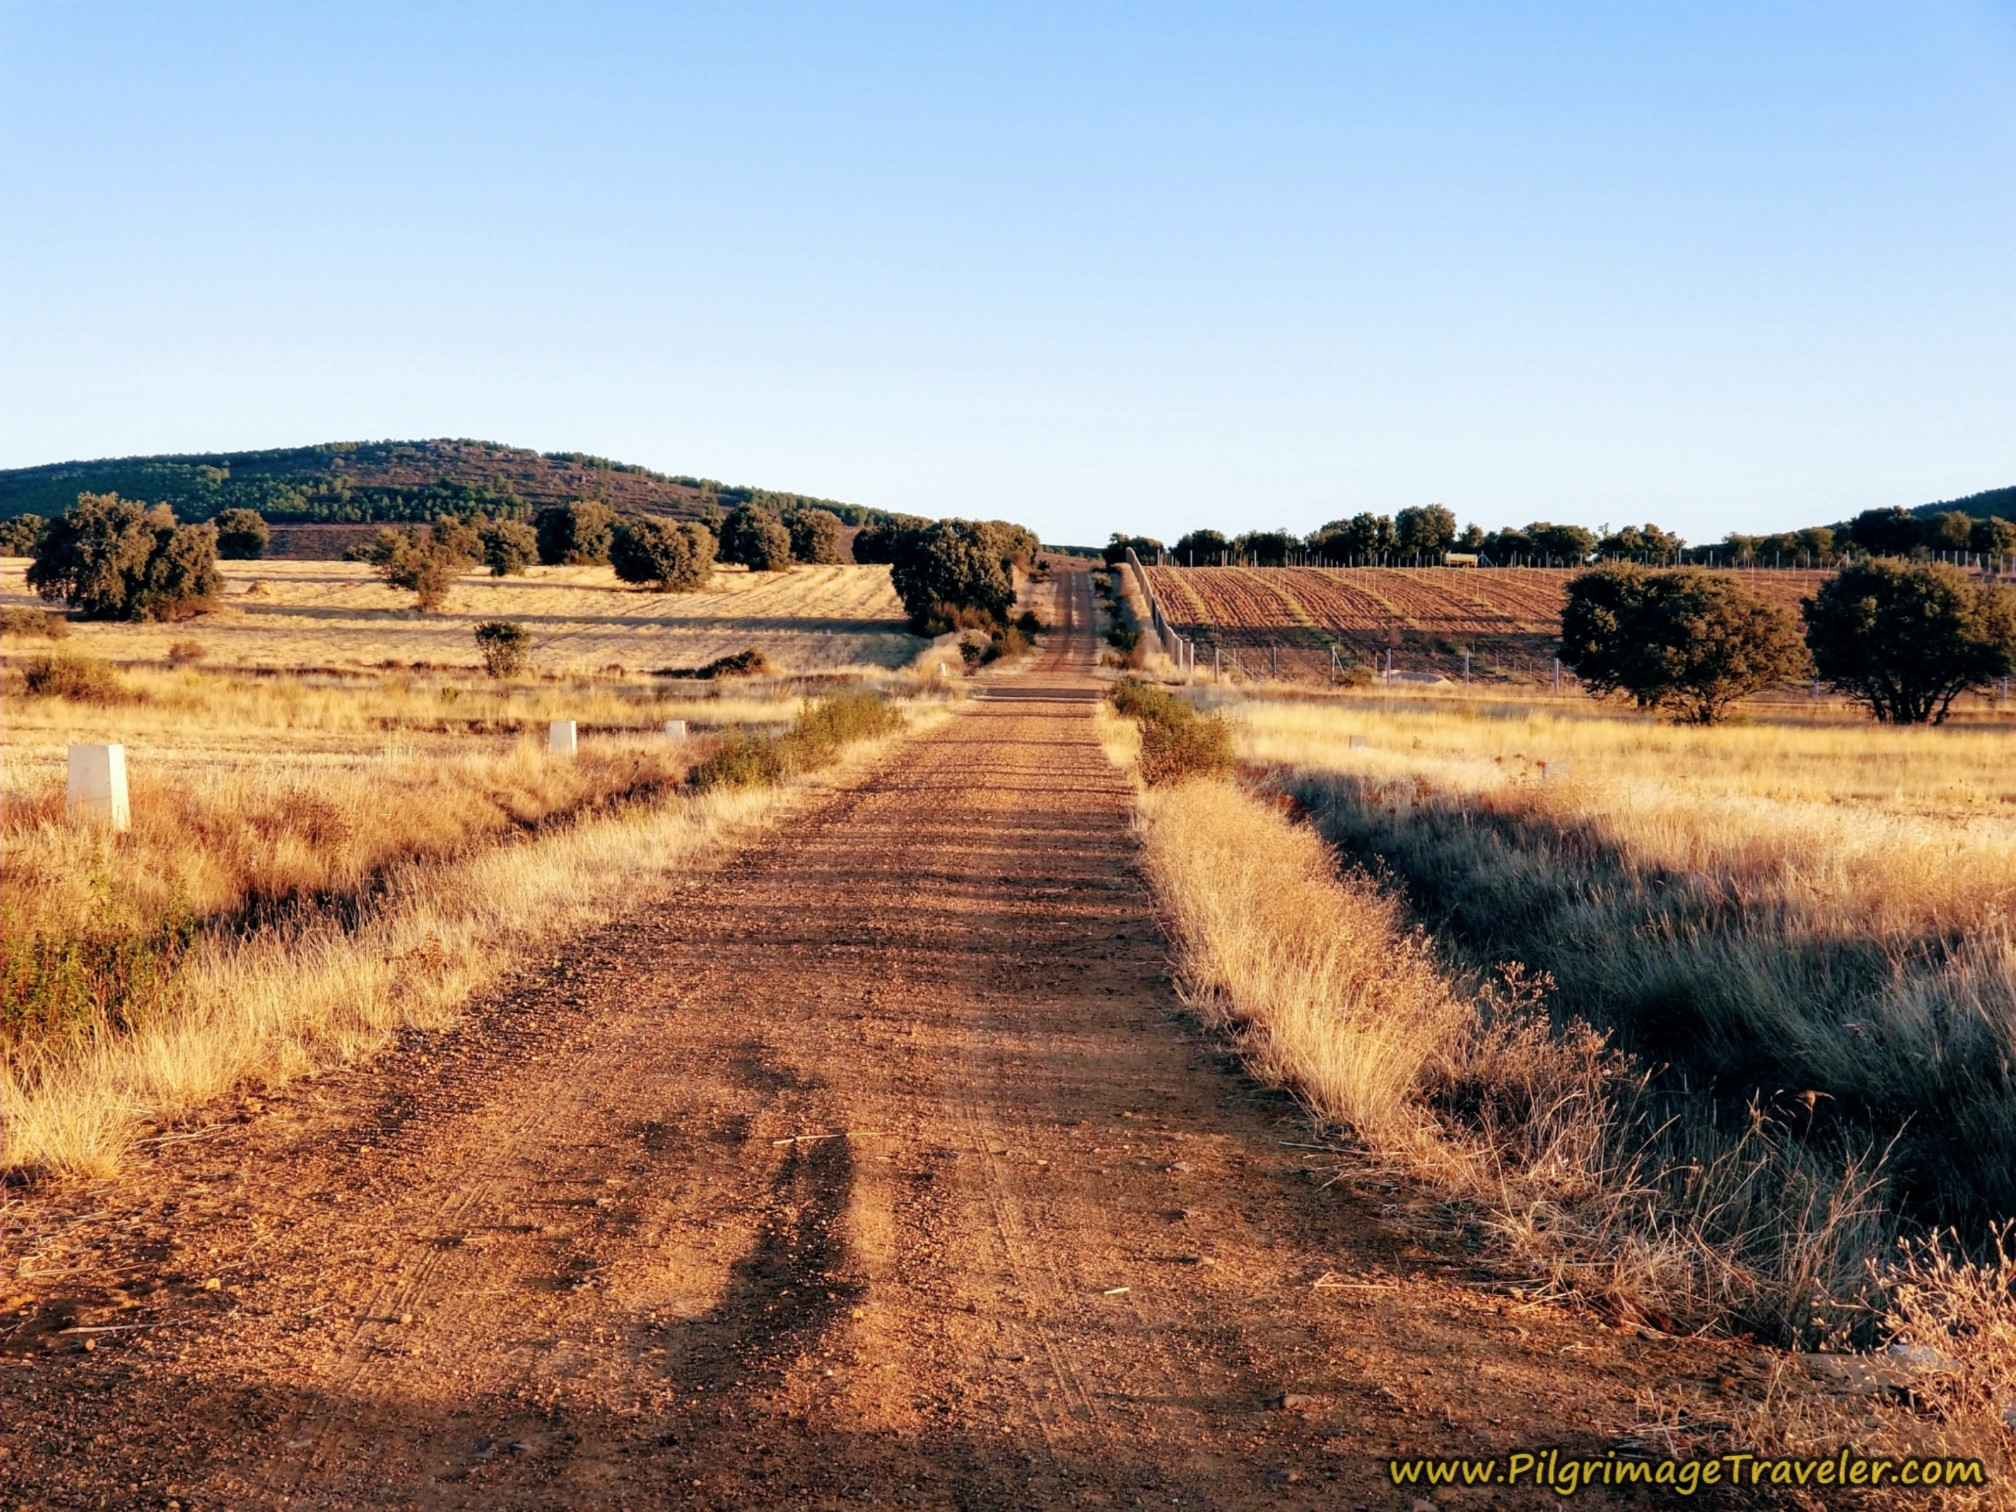 Continuing Northward After Railroad tracks on the Camino Sanabrés from Tábara to Santa Marta de Tera